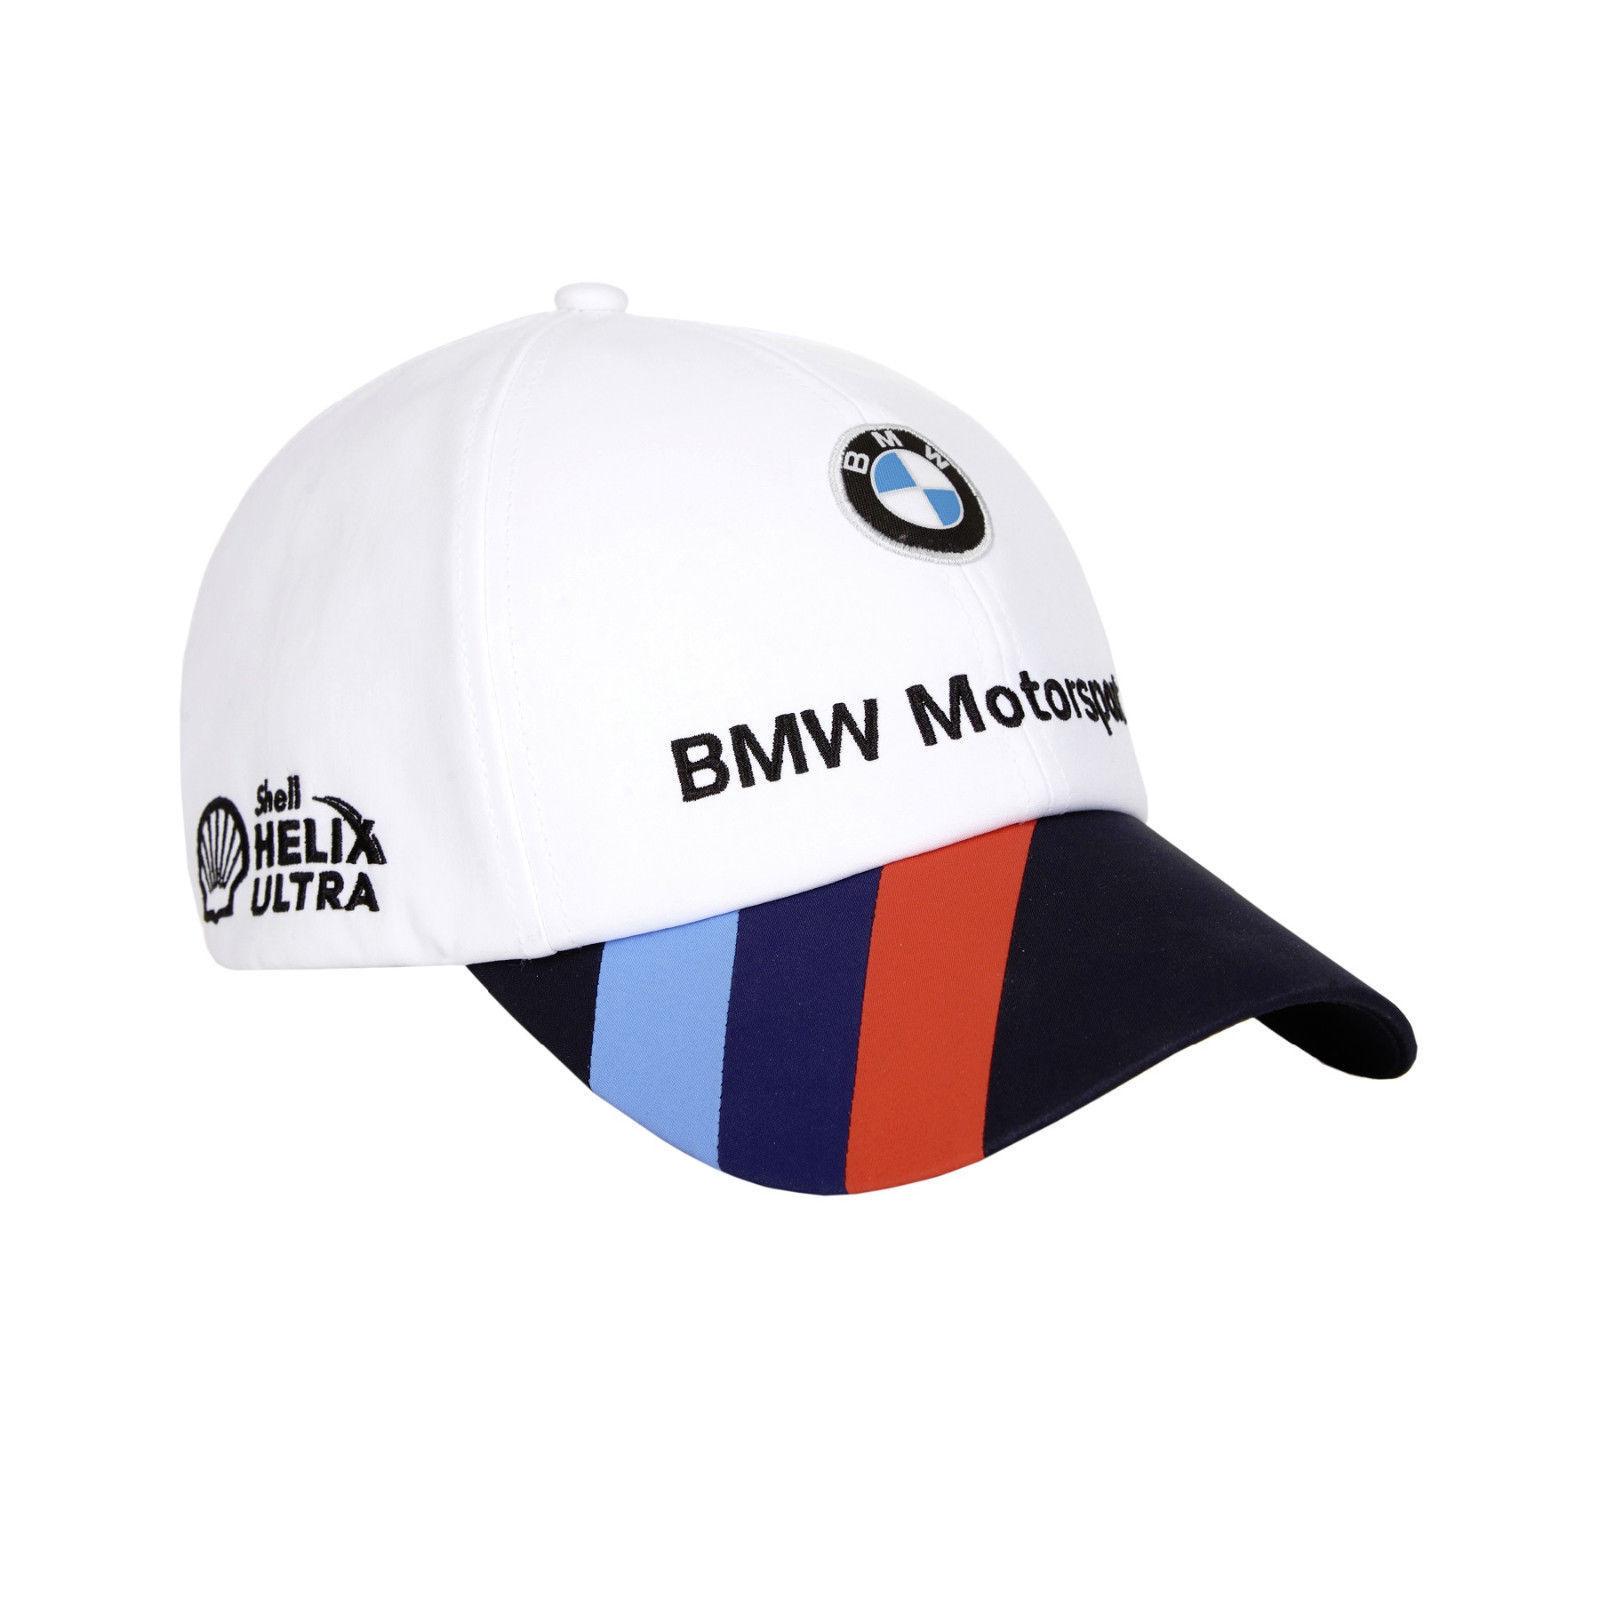 Awesome BMW Motorsports Puma Logo Men s White Adjustable Strap Team Hat M  V-Power Shell 2018-2019 1b2f605b986